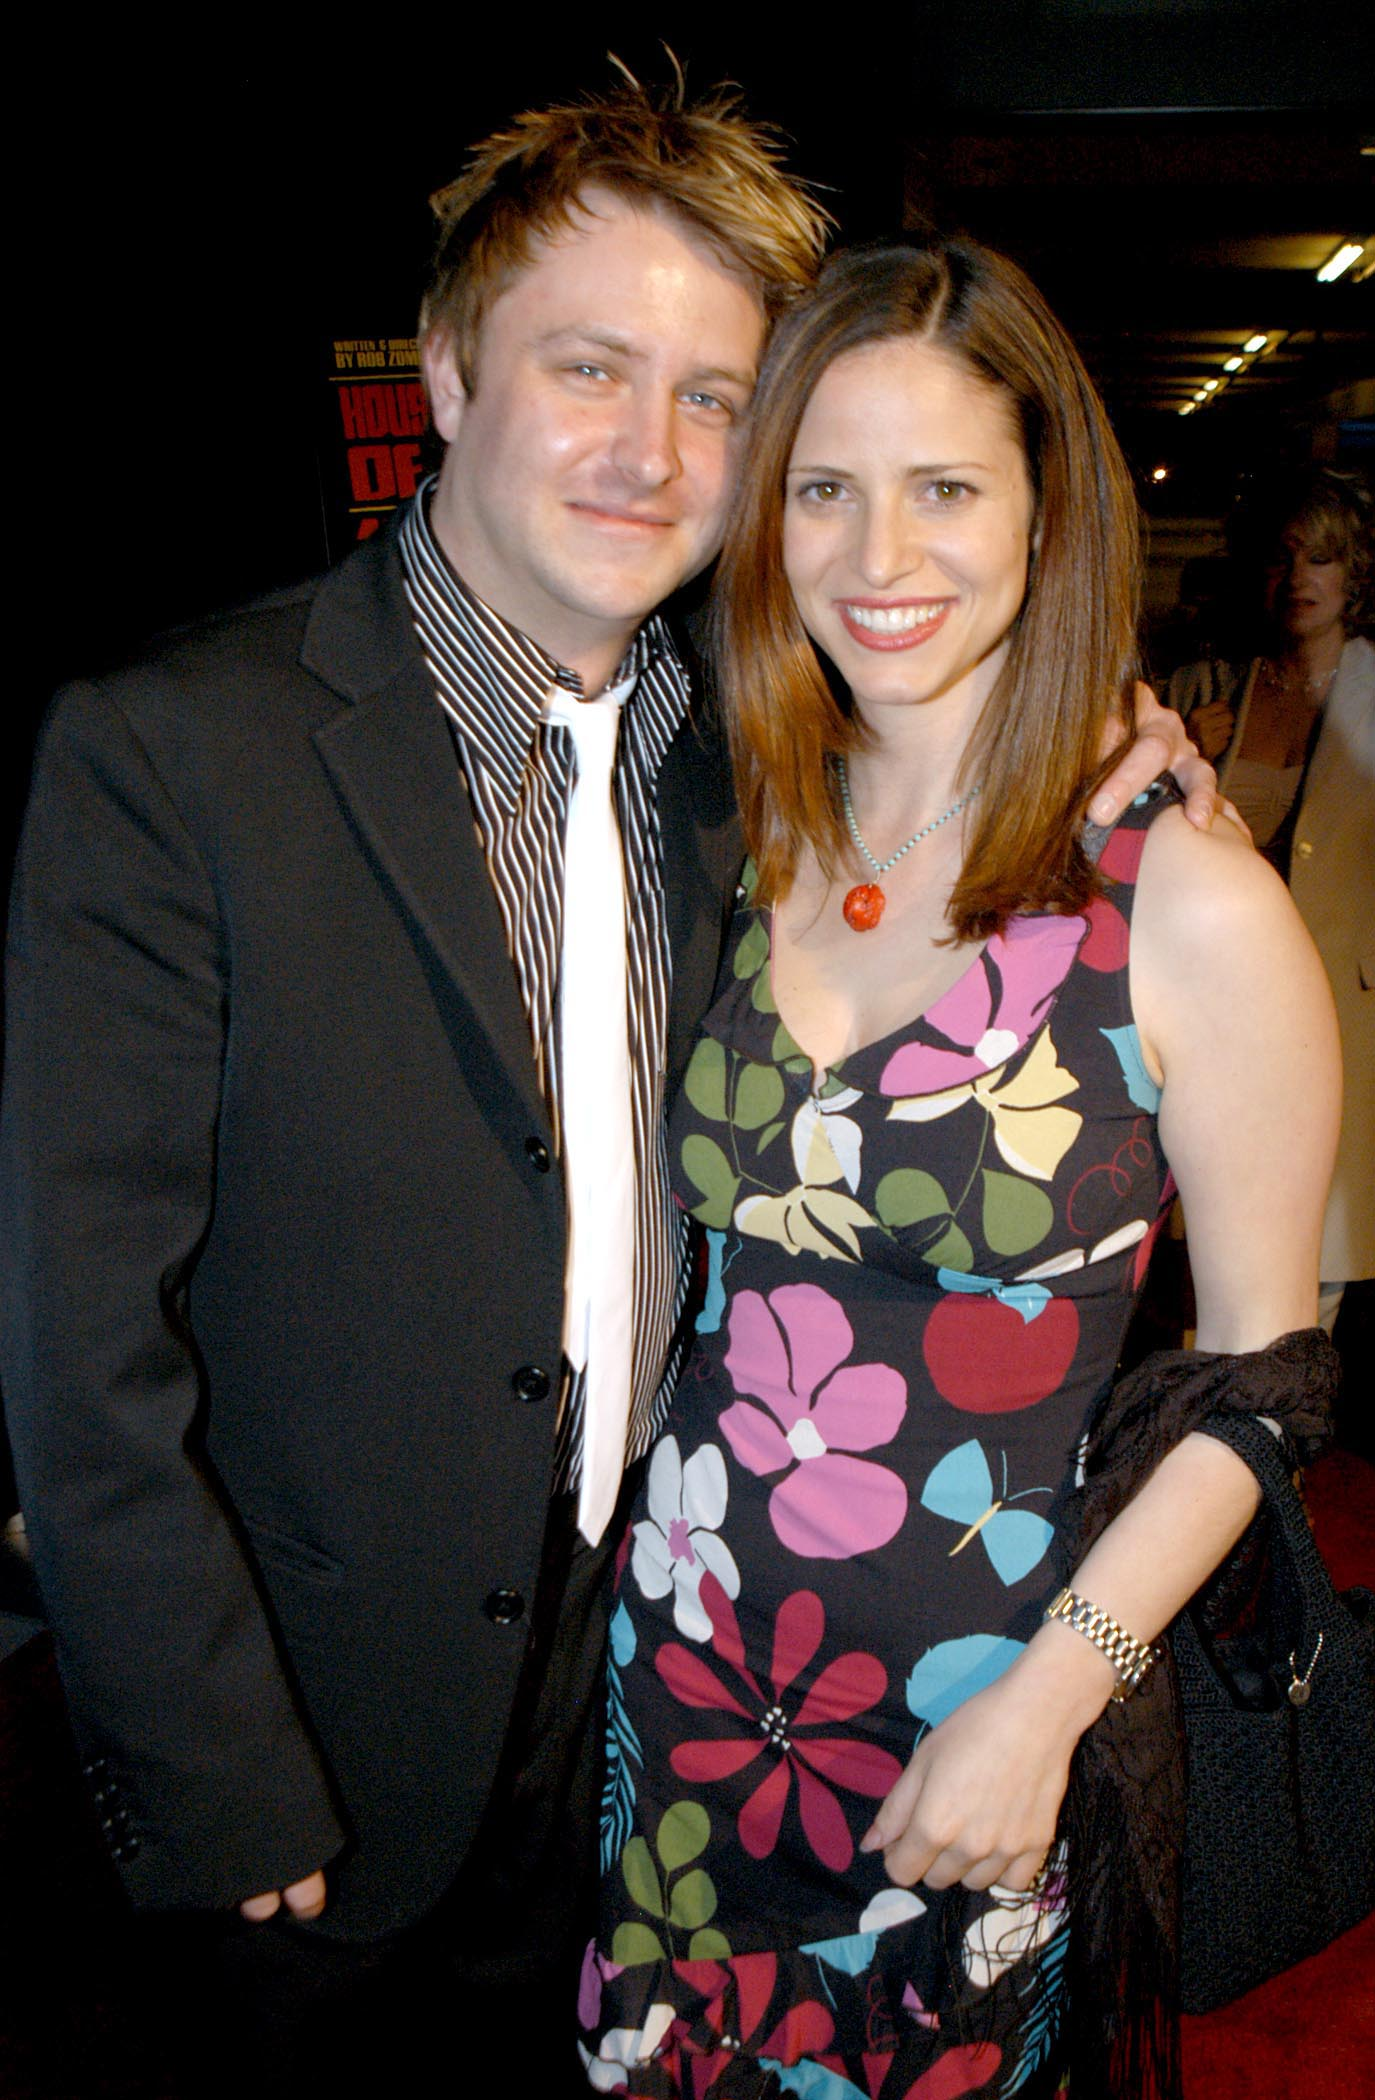 Chris Hardwick and Andrea Savage